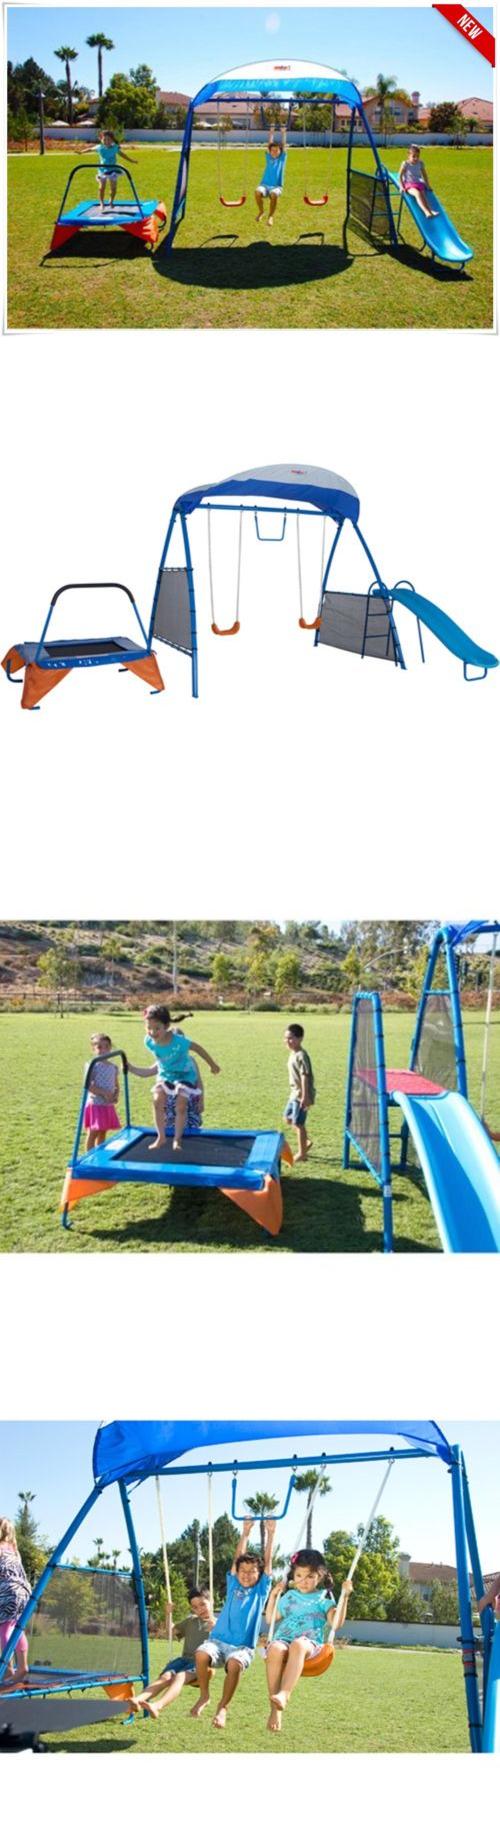 swings slides and gyms 16515 swing set playground metal swingset